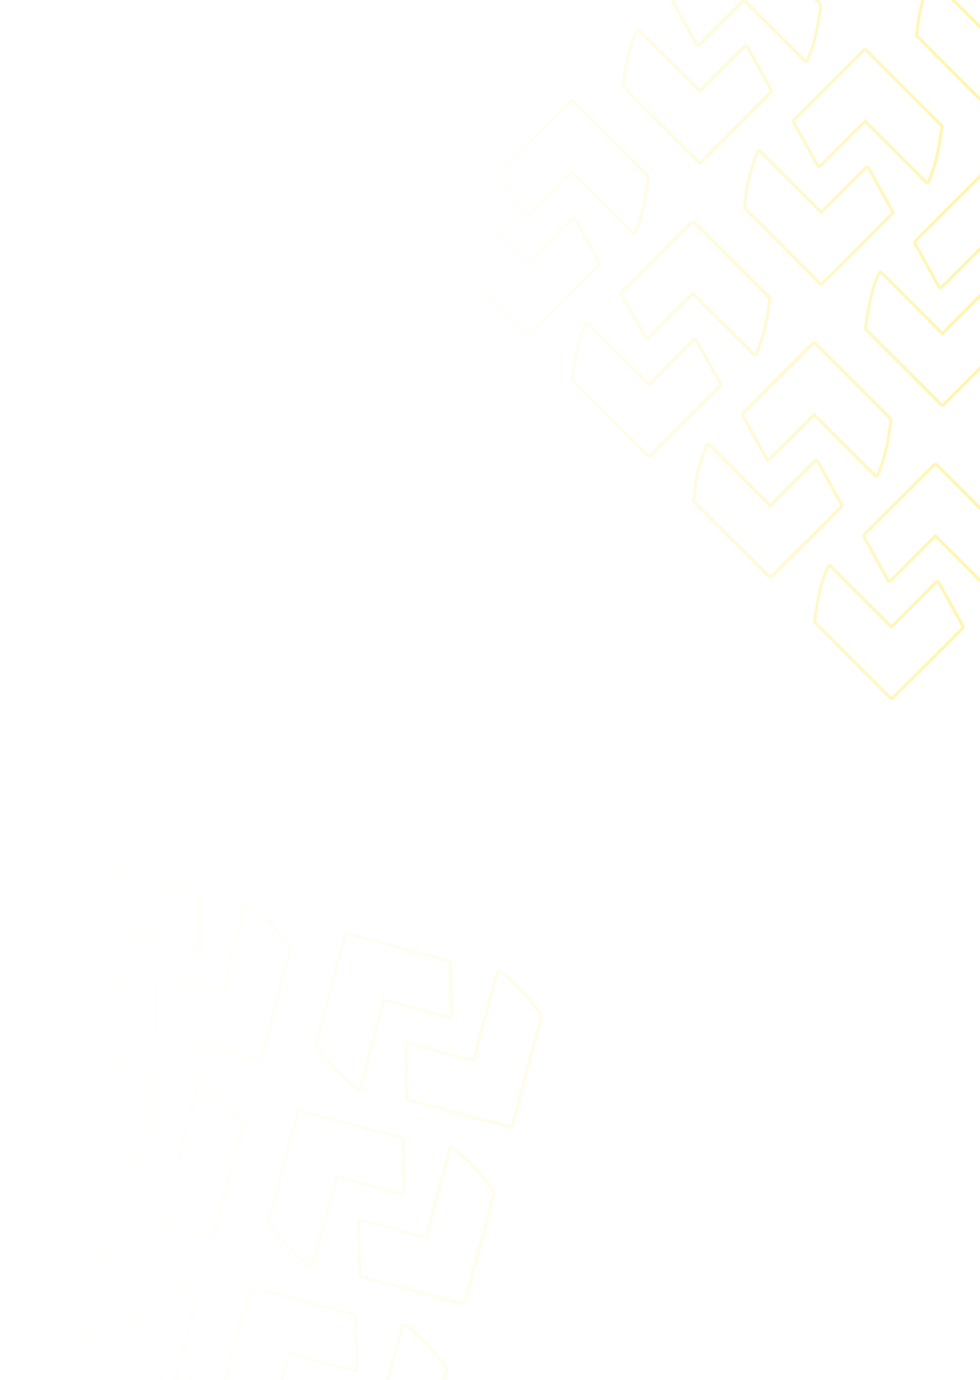 background-logos.png